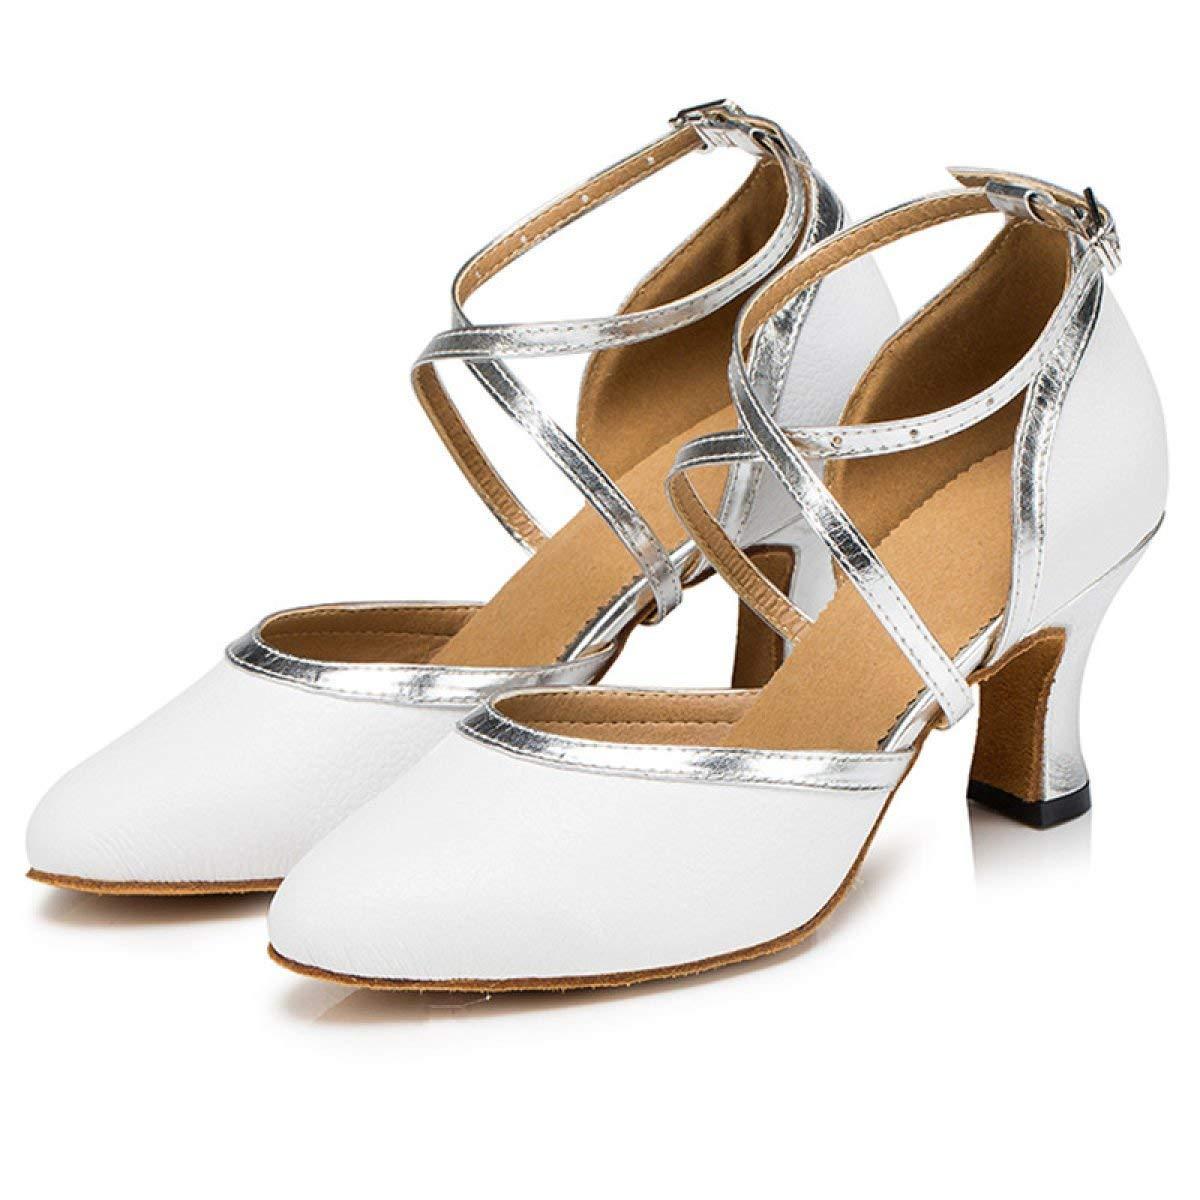 Damen Latin Dance Closed Toe High Heel UP Leder Glitter Salsa Tango Moderne Ballrom Mary Jance Tanzschuhe WeißHeeled6cm-UK5.5   EU38   Our39 (Farbe   Weißheeled8cm Größe   UK3 EU33 Our34)